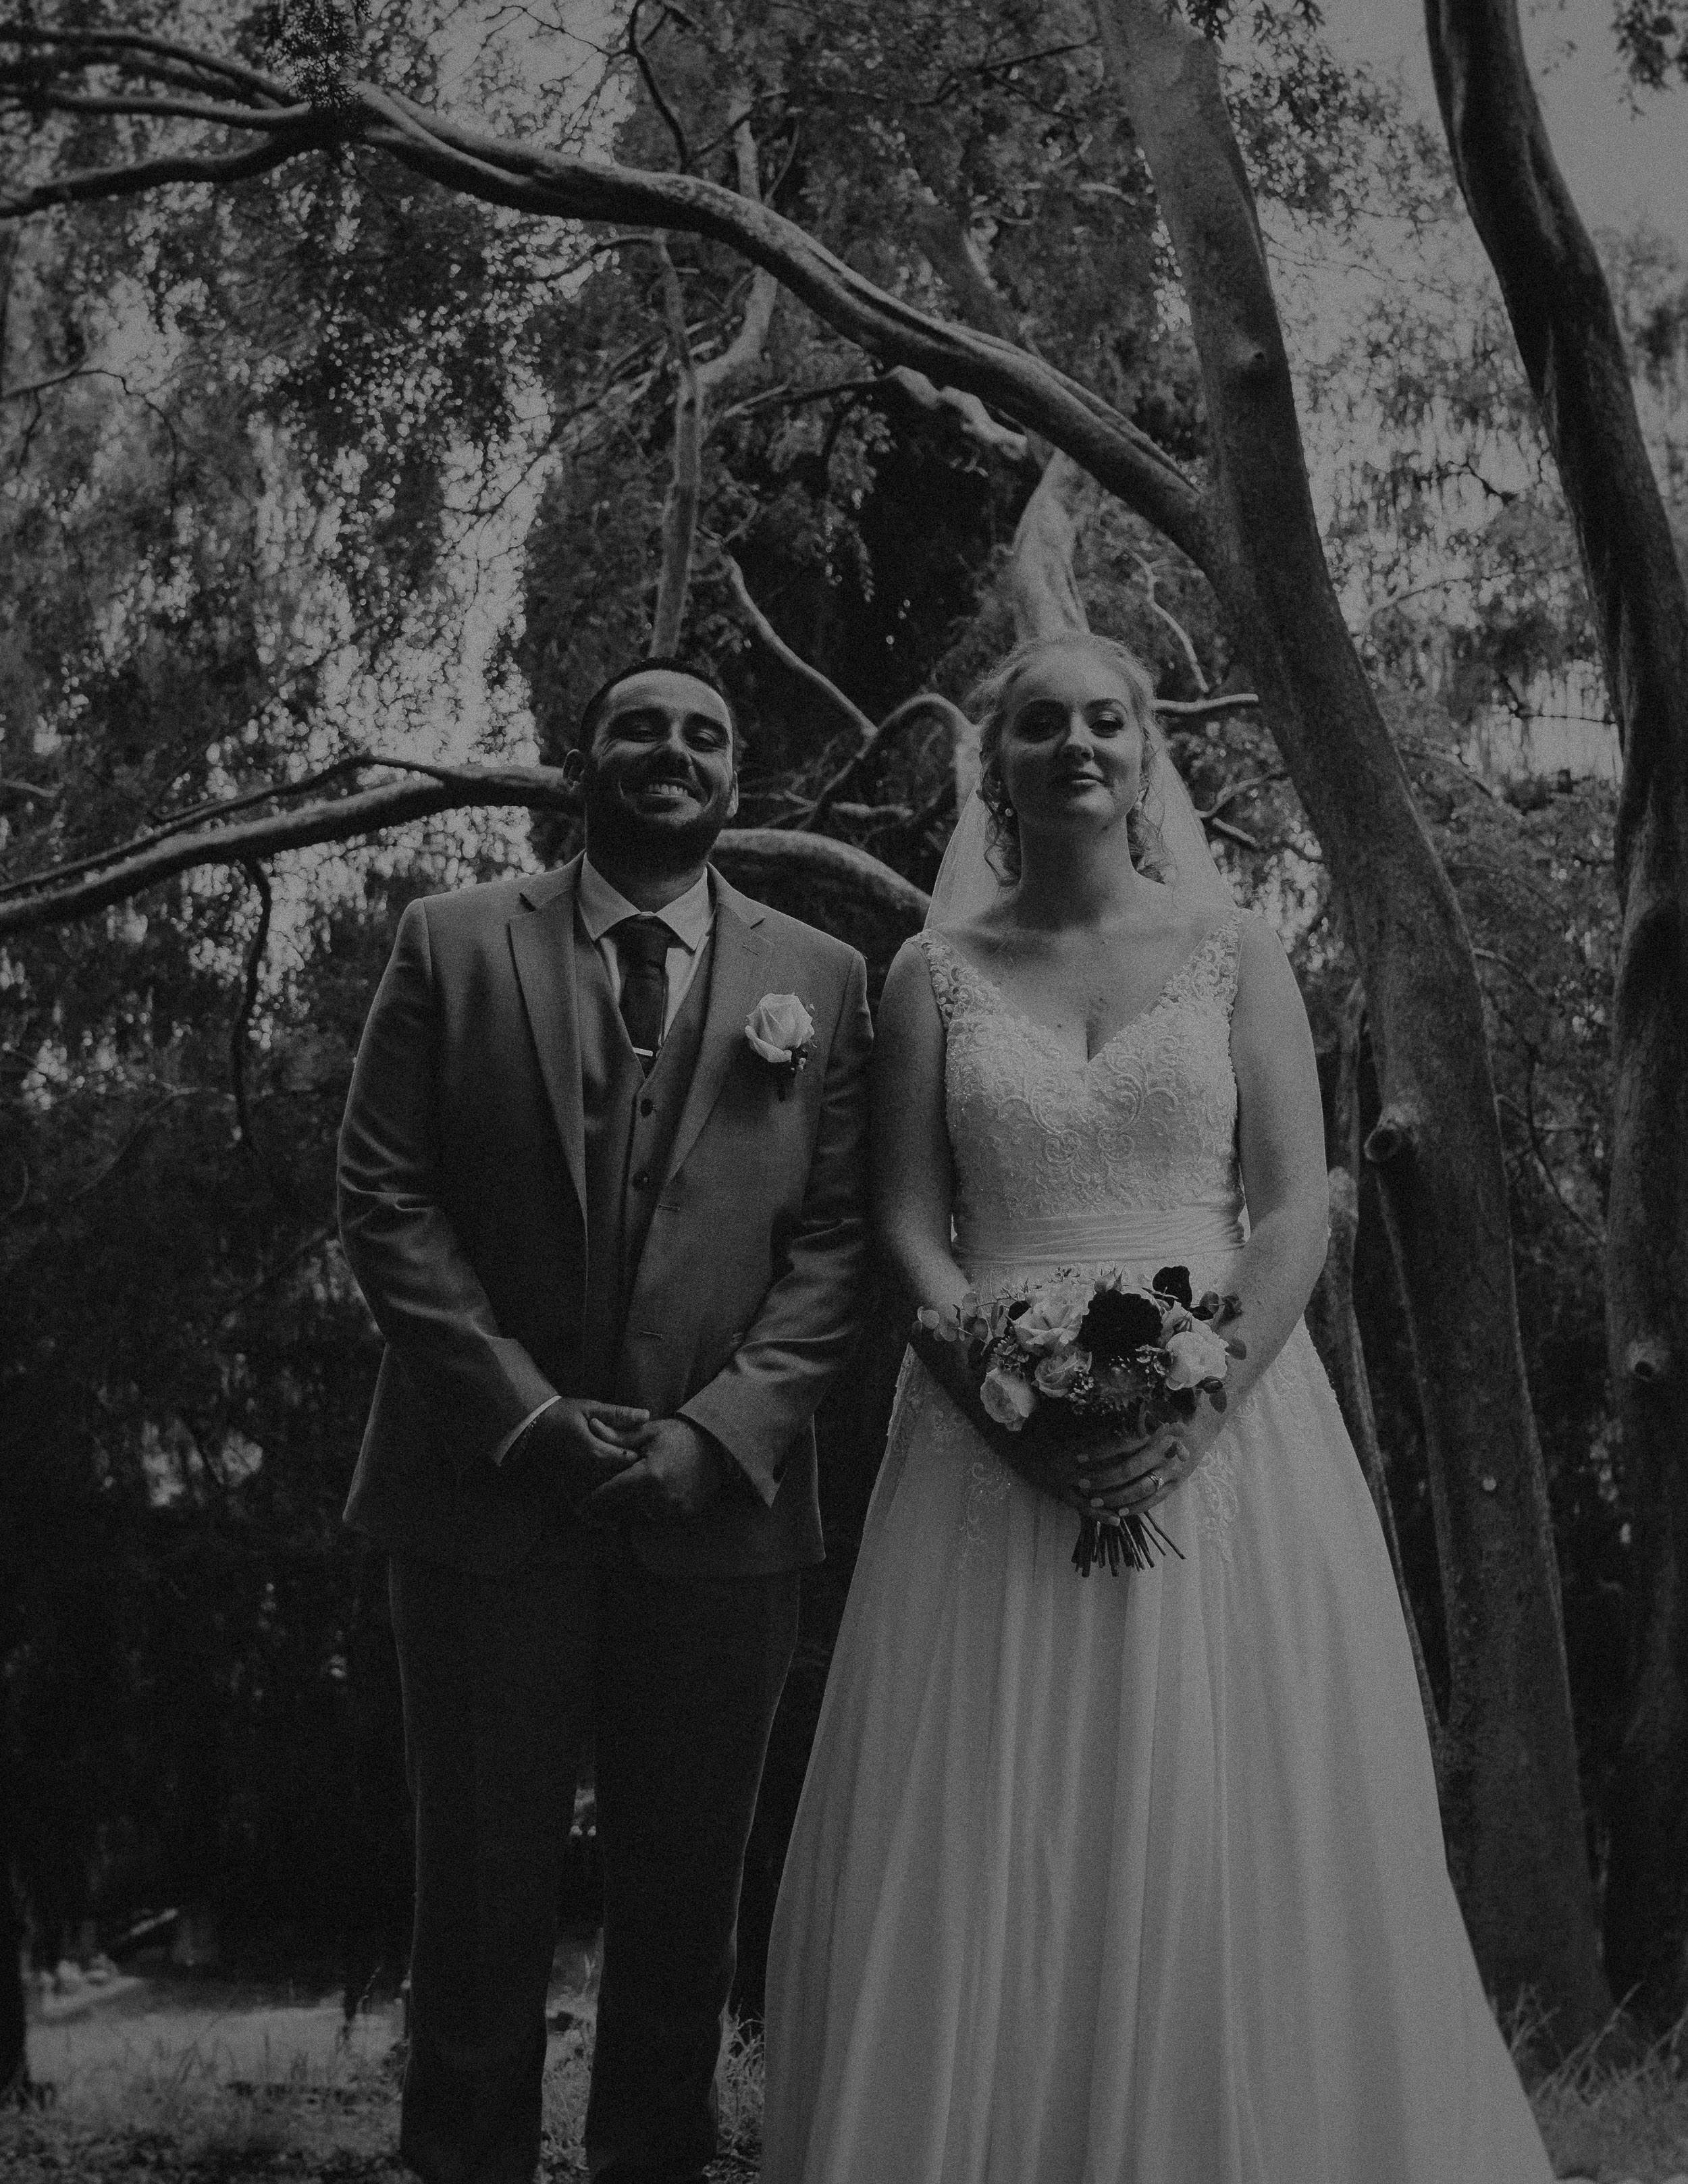 sav & mike_elopement wedding photography_kings & thieves_blog (8 of 44).jpg